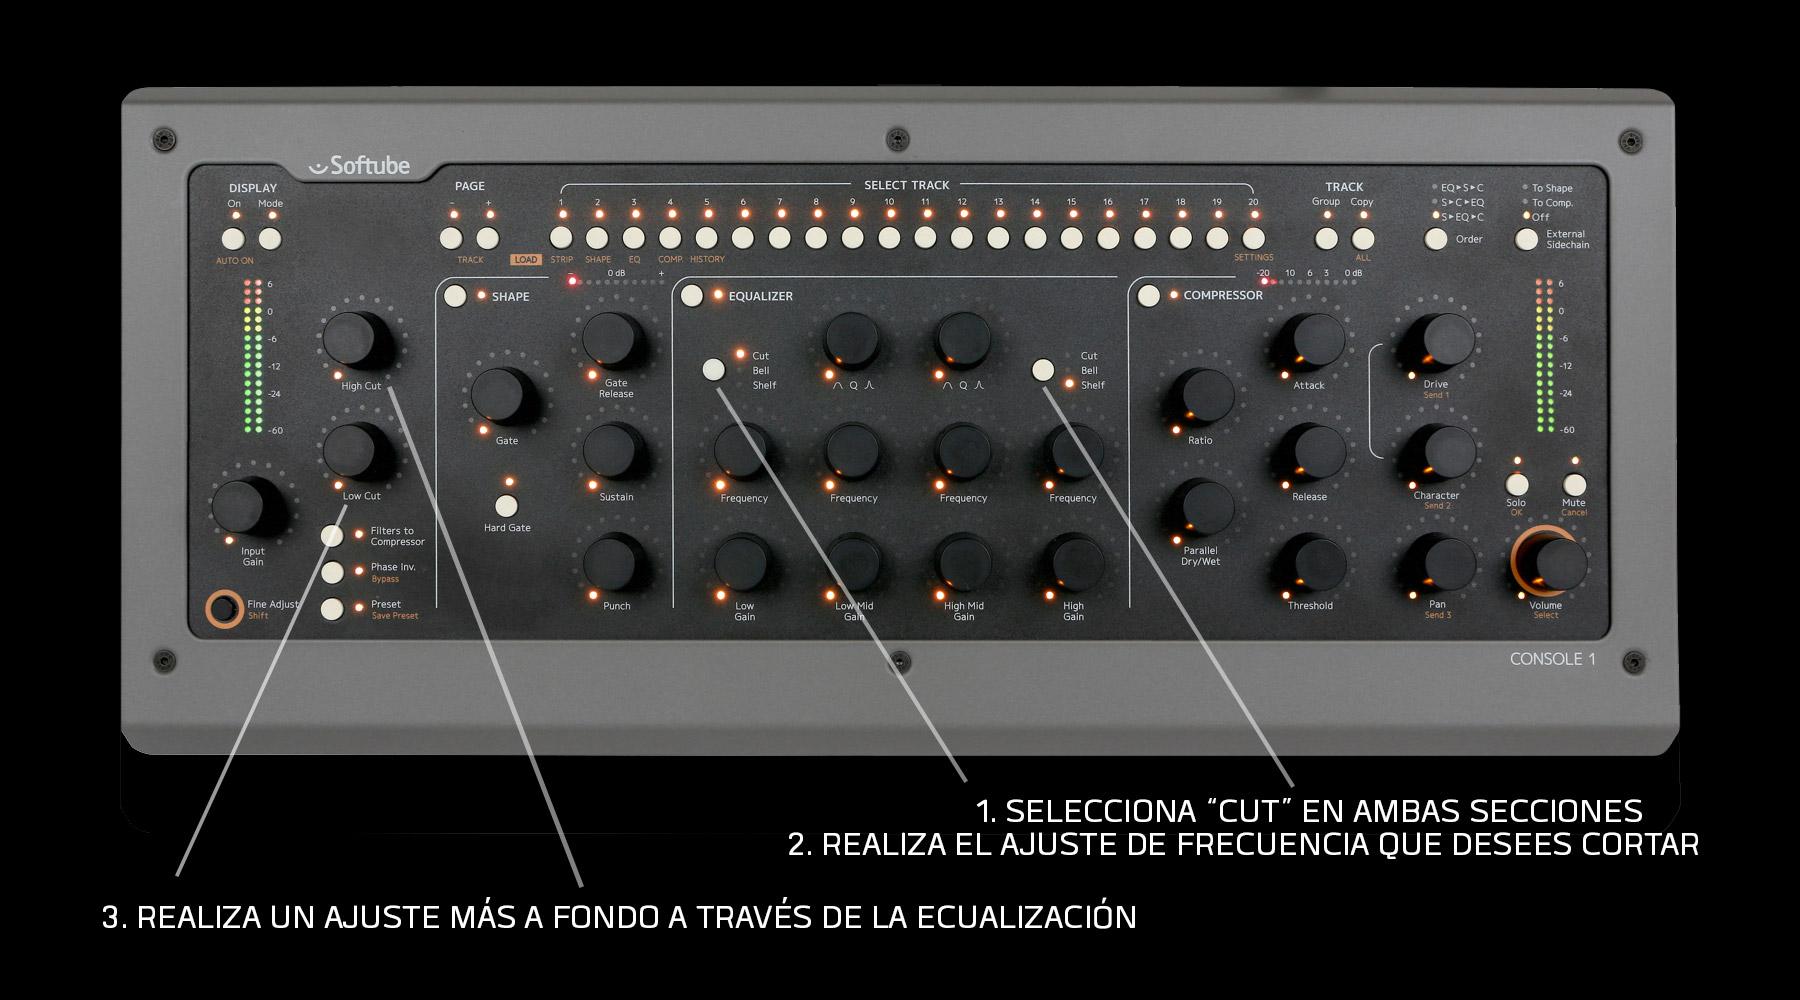 5-trucos-para-Console-1-screenshot-4